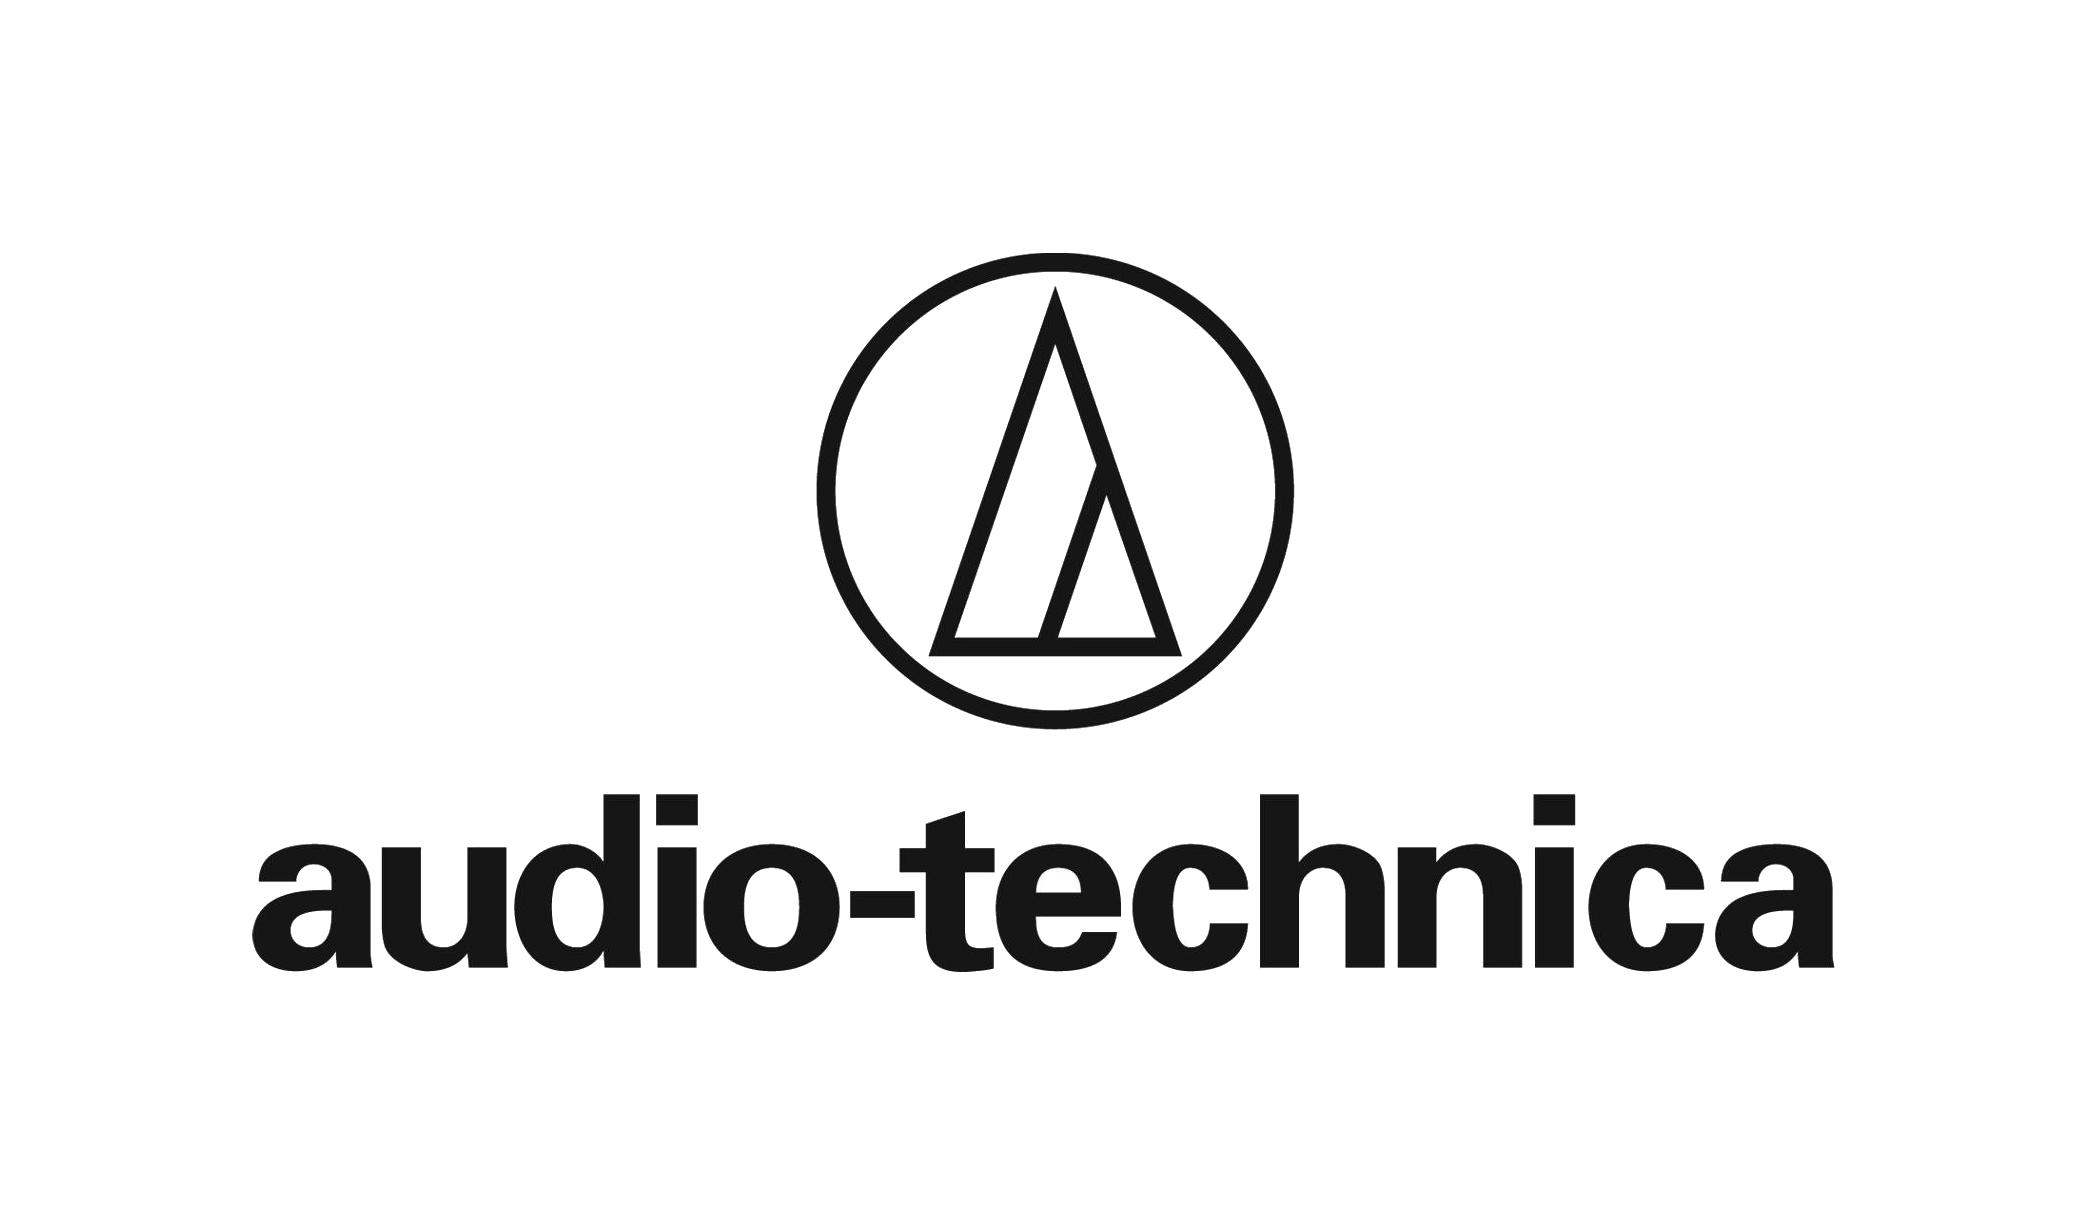 audio-technica-20r copy.png